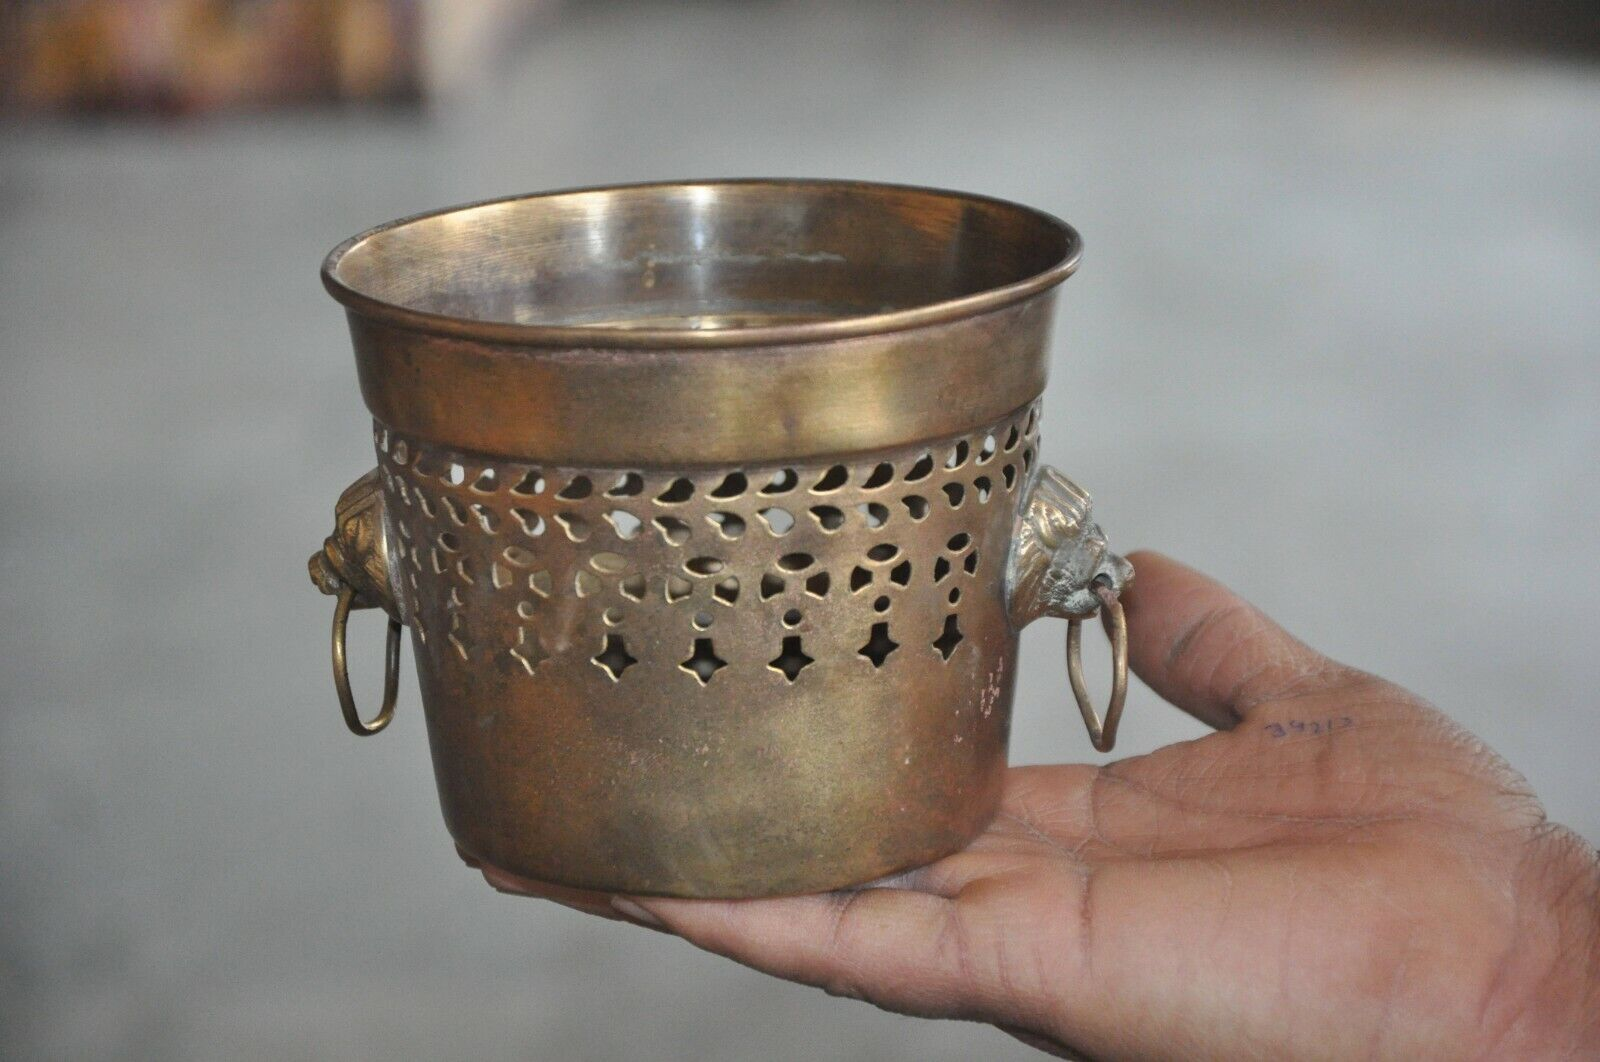 Old Brass Handcrafted Jali Cut Flower Pot/Planter